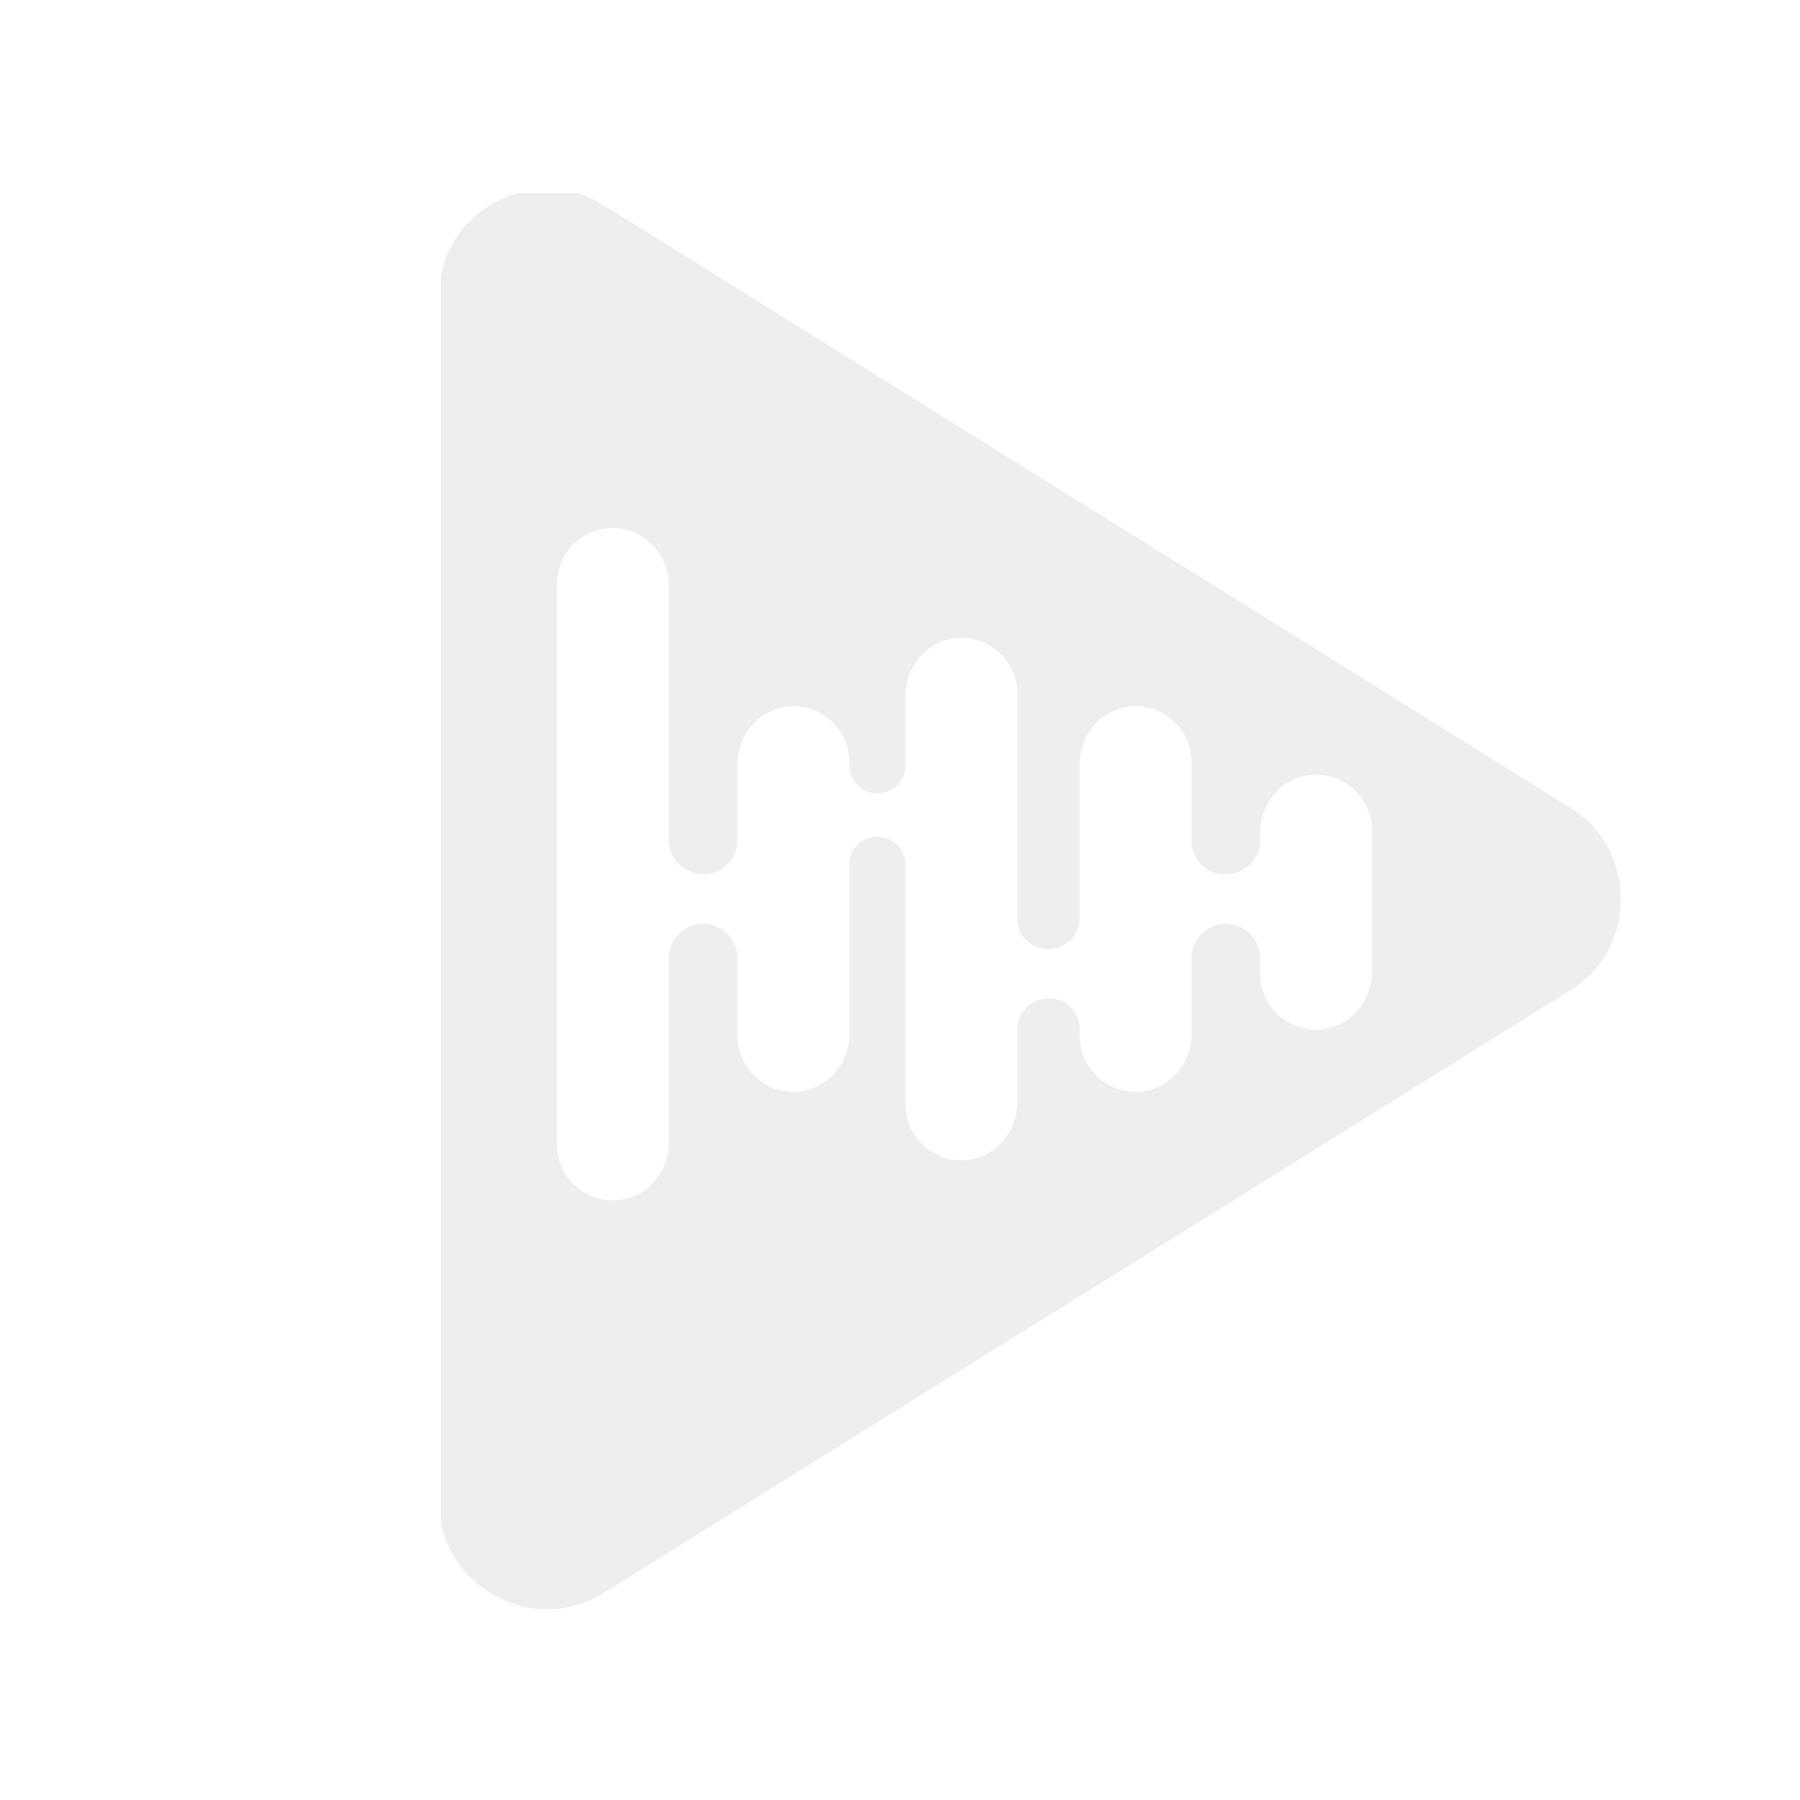 Hertz DBX 25.3